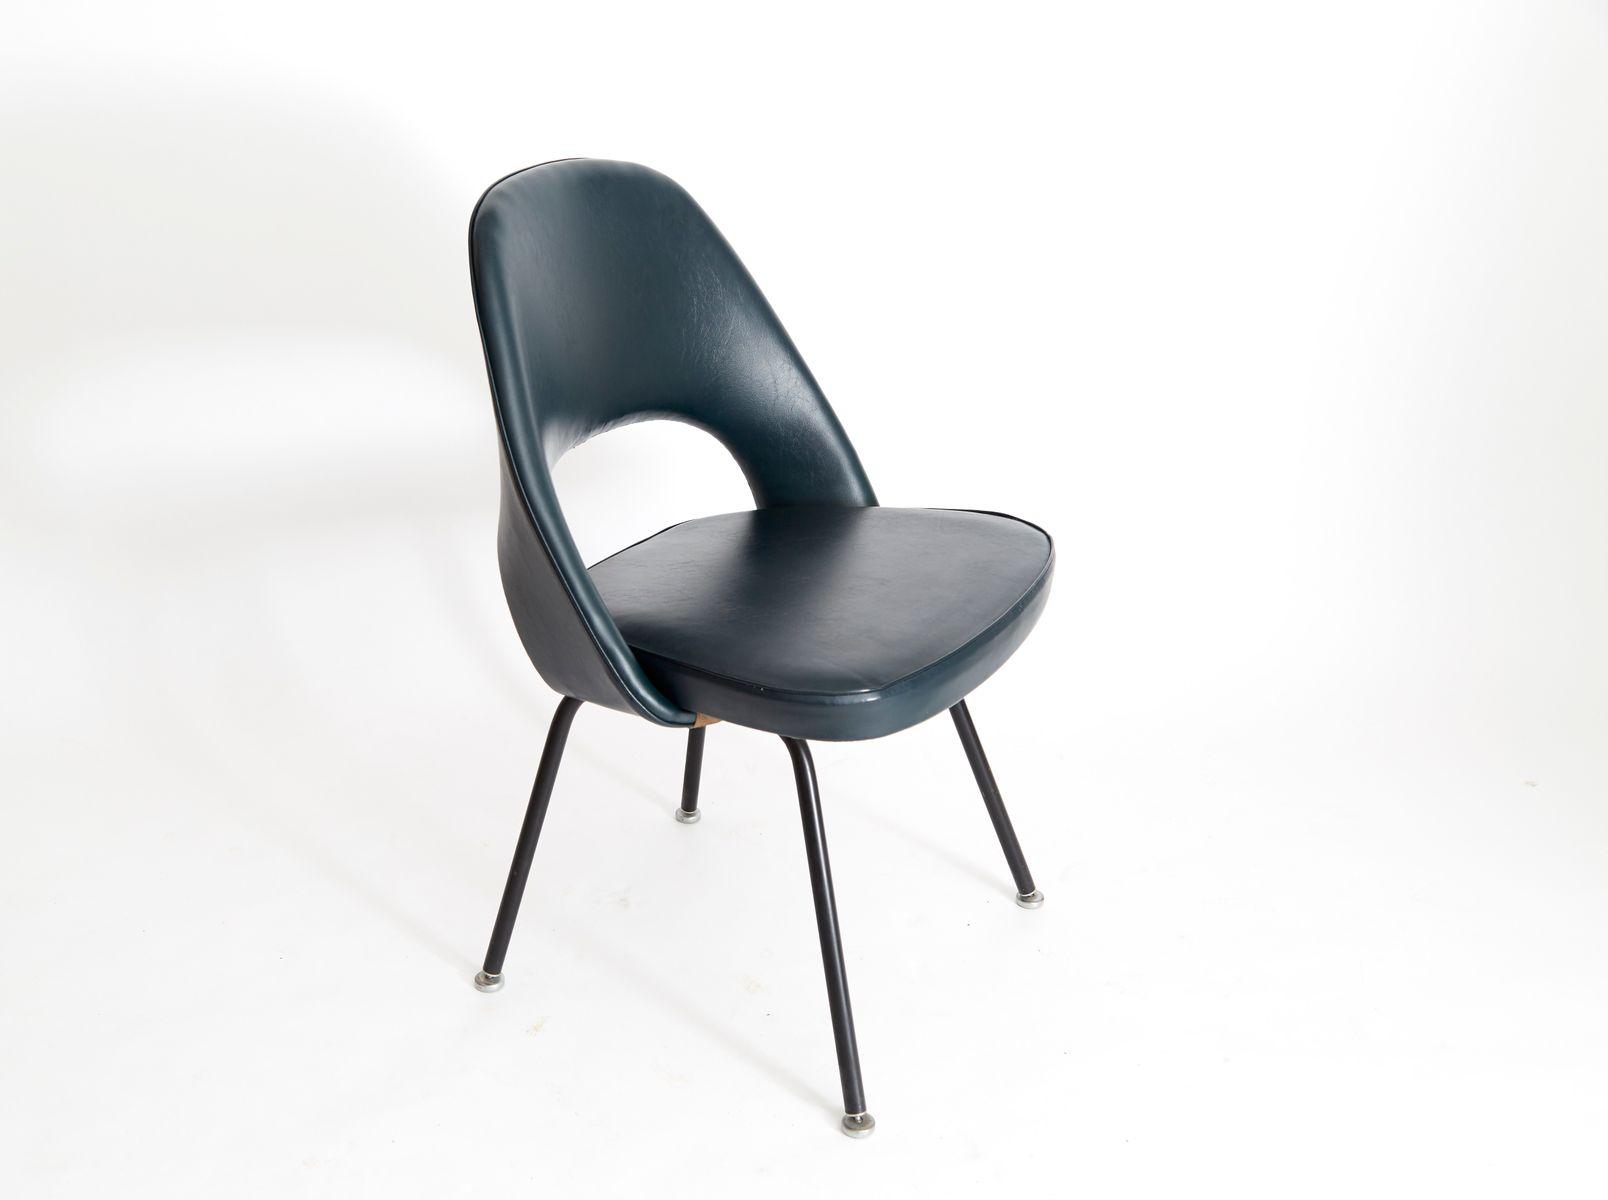 Vintage Executive Chair 72 by Eero Saarinen for Knoll